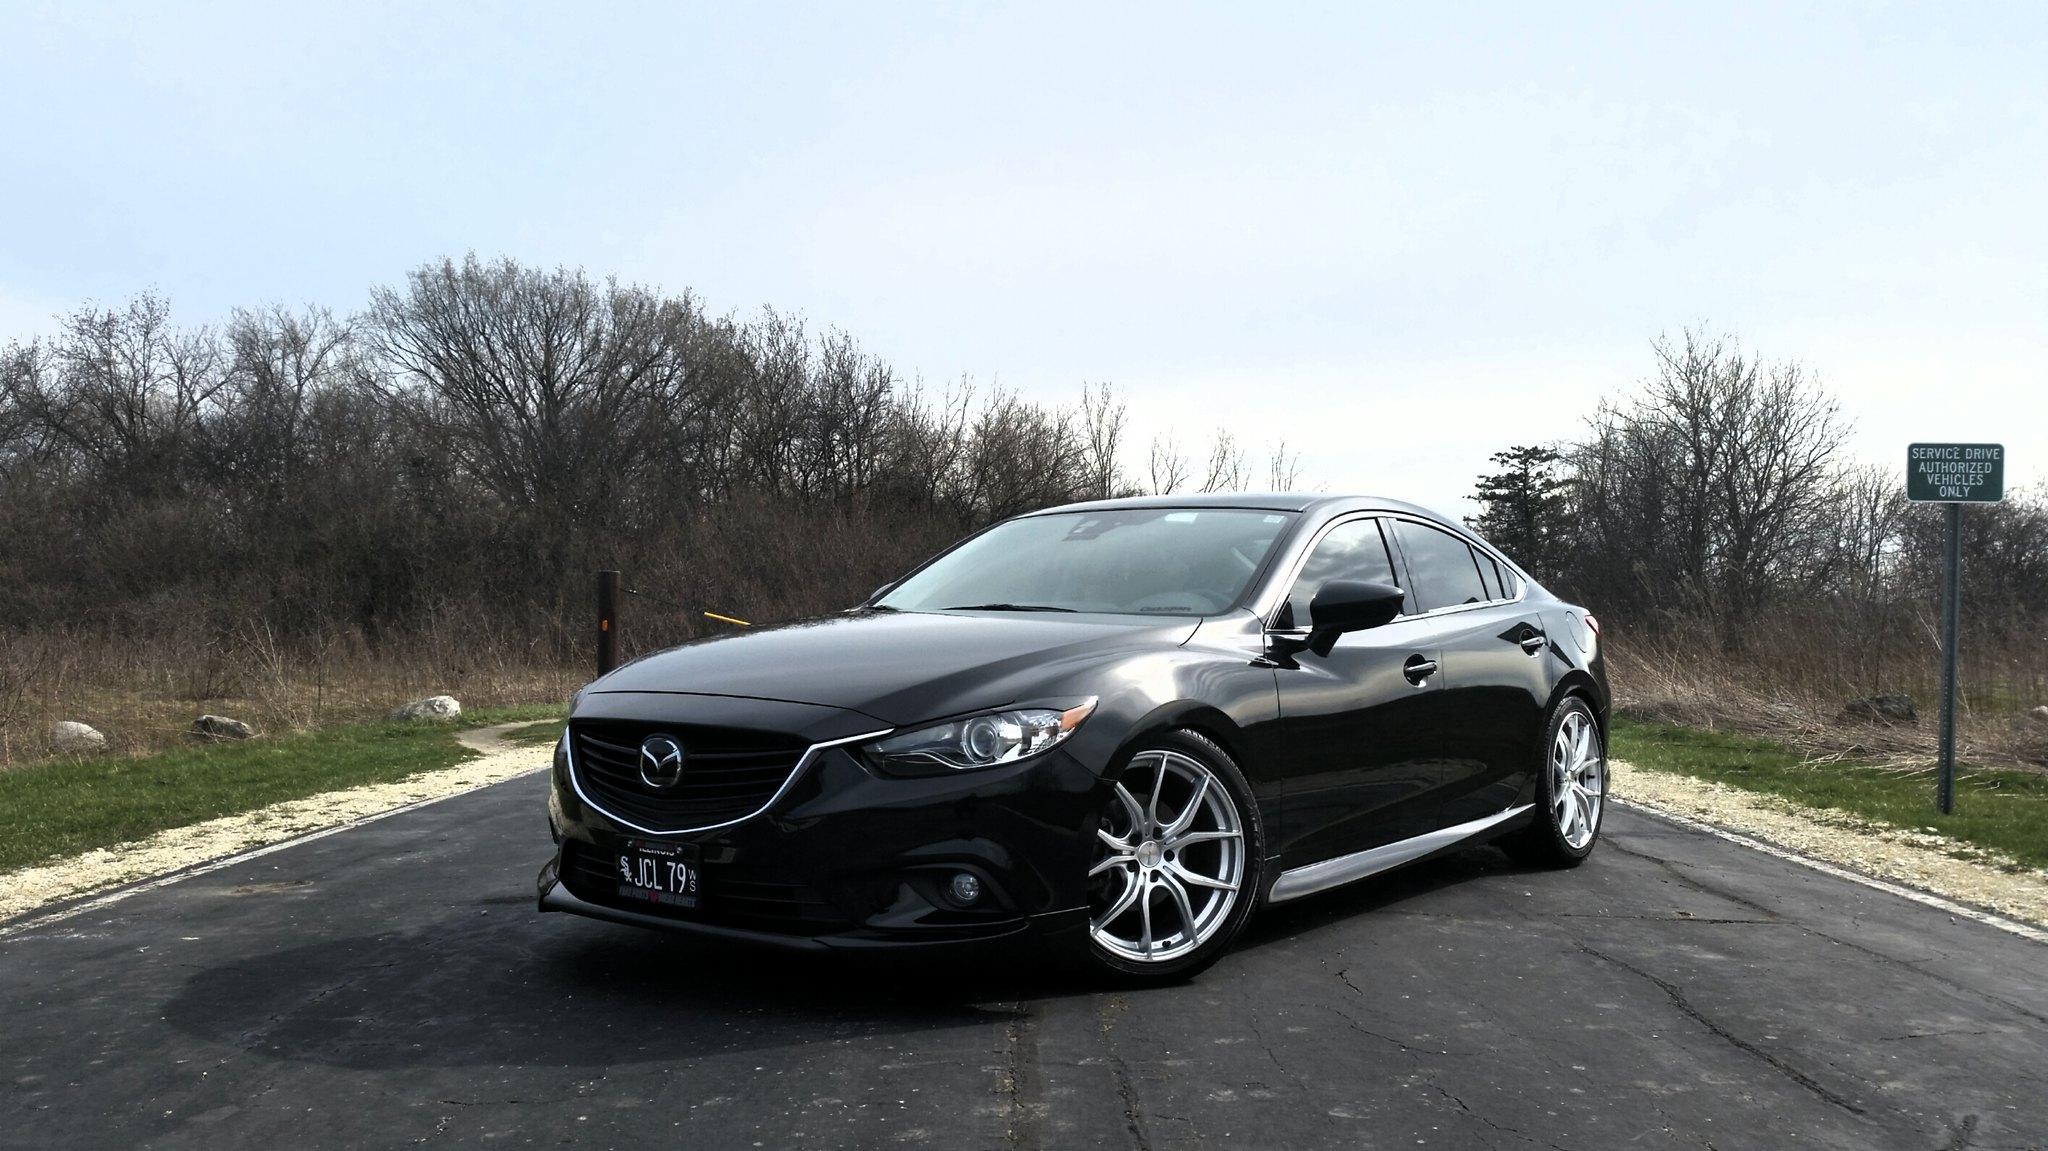 Mazda 6 Forum >> May 6otm Winner Mazda 6 Forums Mazda 6 Forum Mazda Atenza Forum